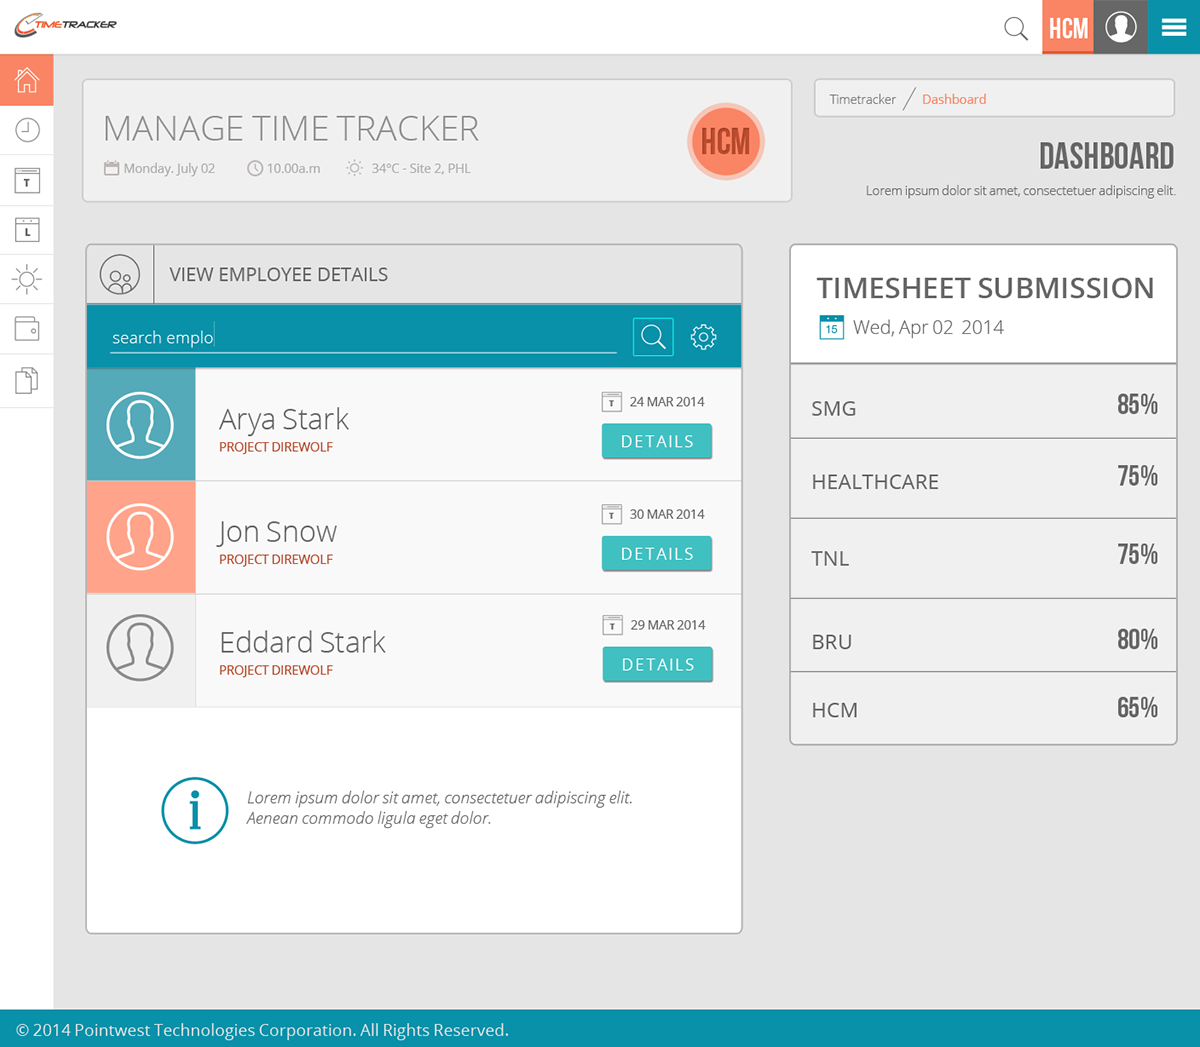 Timetracker Dashboard Re-design Concept on Behance